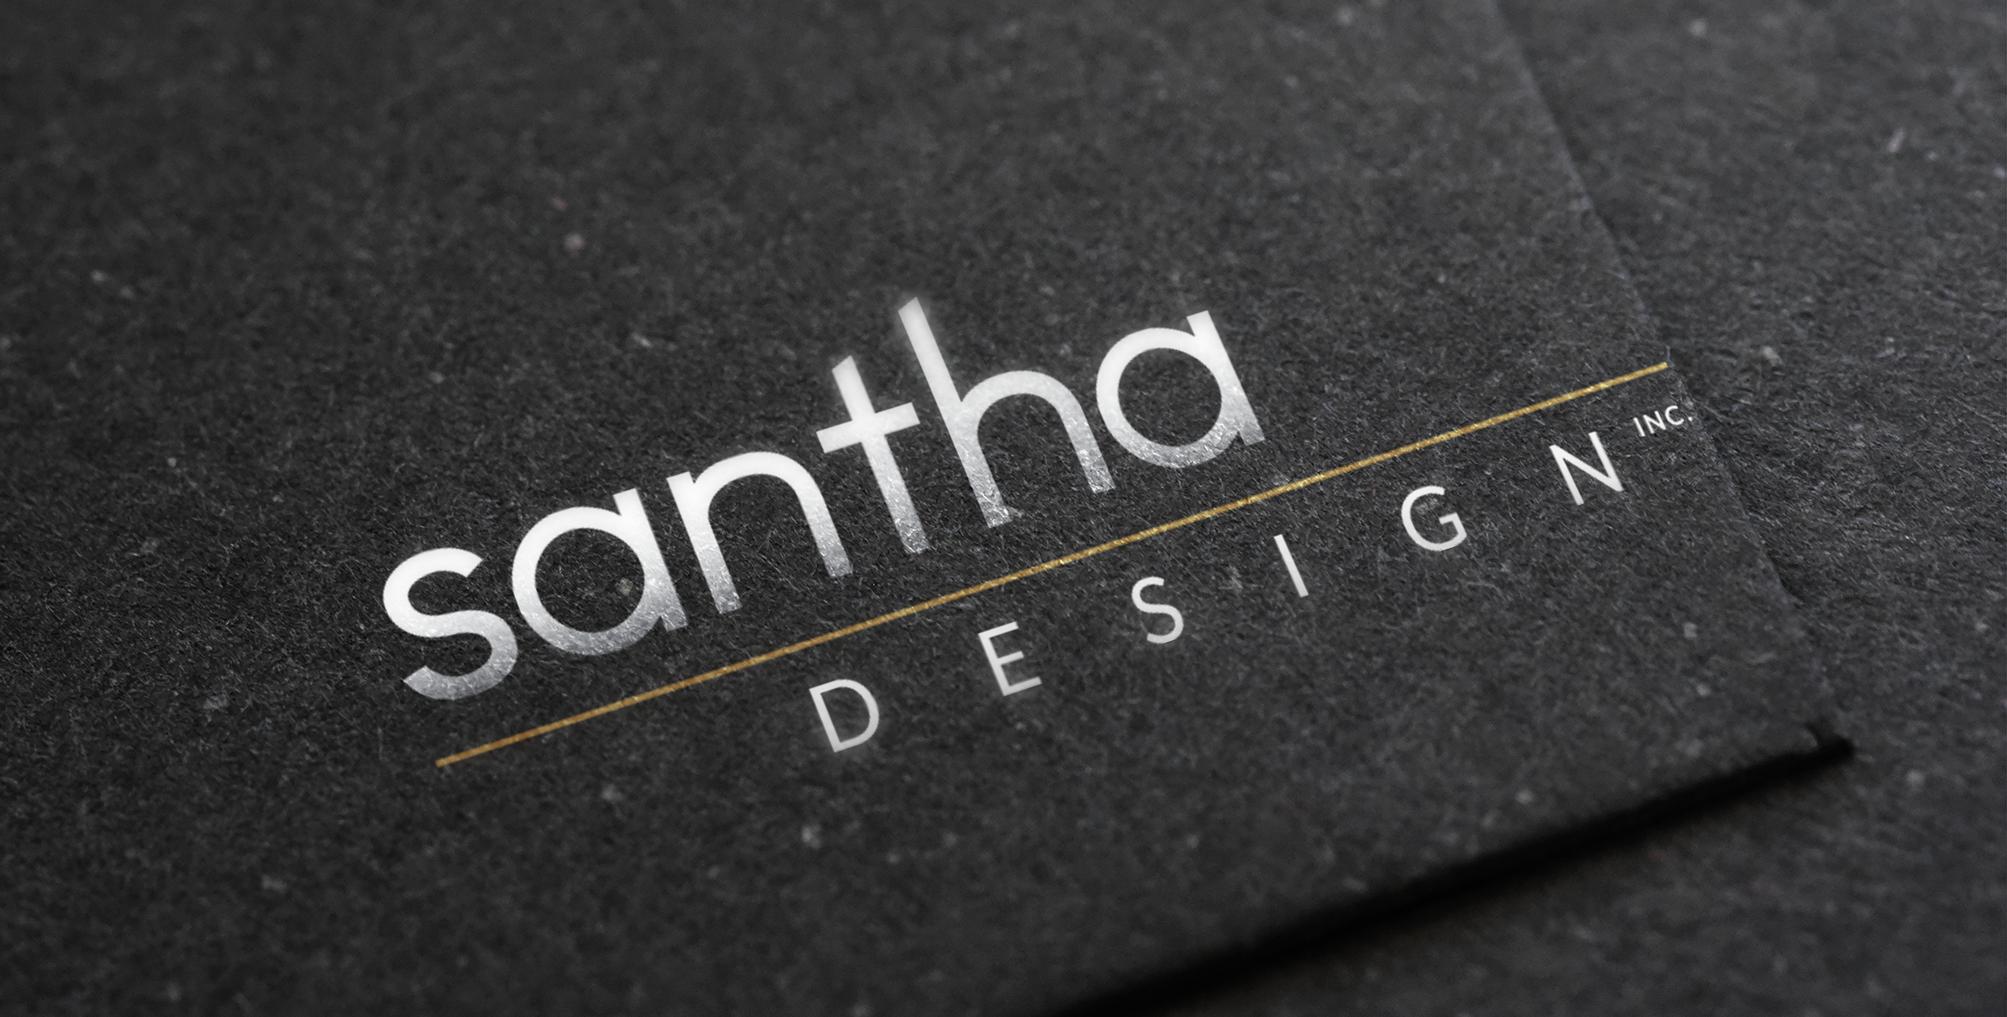 Santha_logo1.png